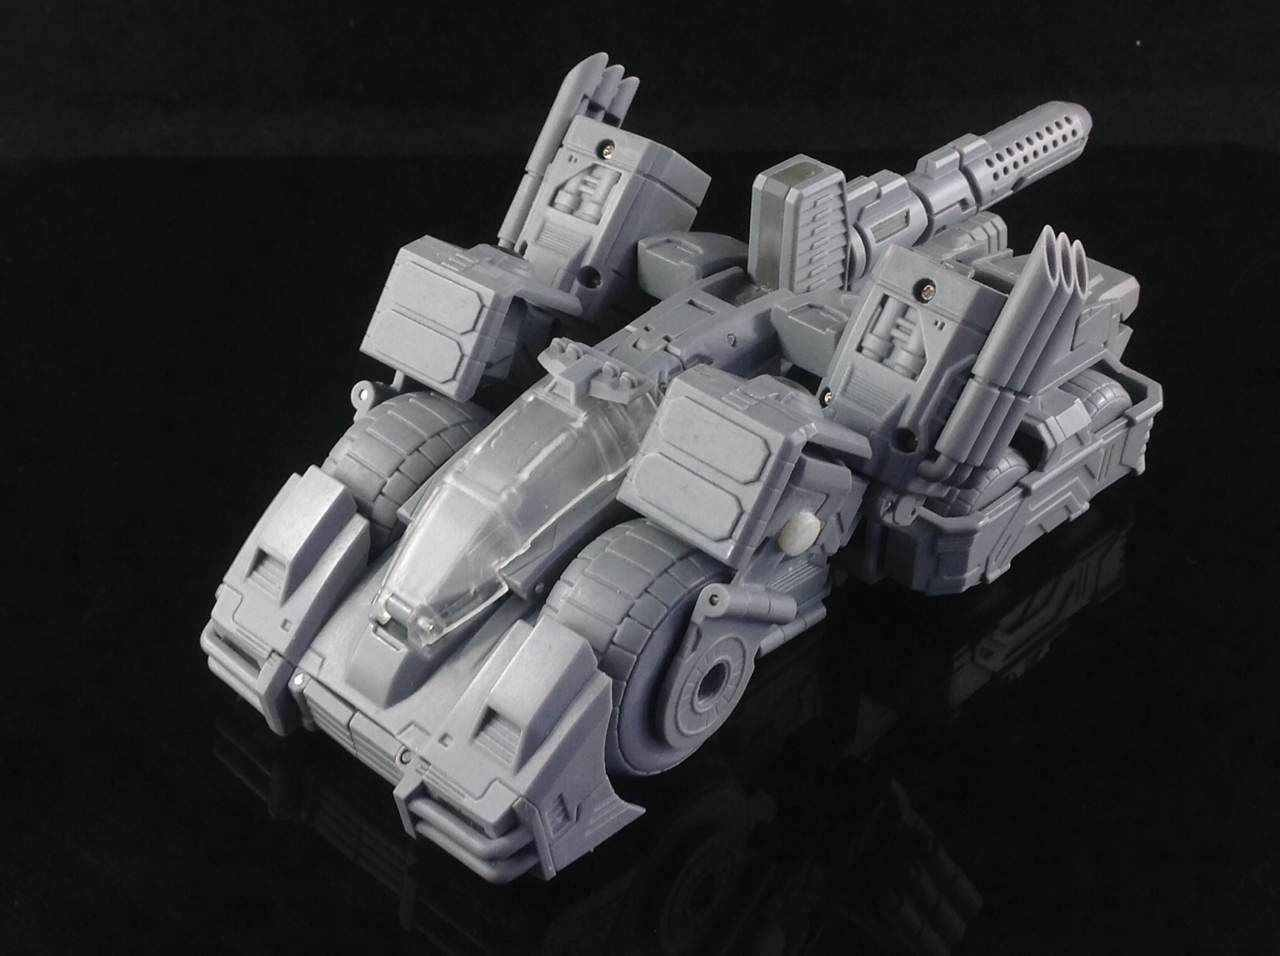 [SparkToys] Produit Tiers - ST - aka War Within: Optimus, Mégatron, Grimlock/La Menace, etc 27519524d1432834214-spark-toys-war-within-optimus-prime-11181950_1429478047357531_2033685179_o_1432834996